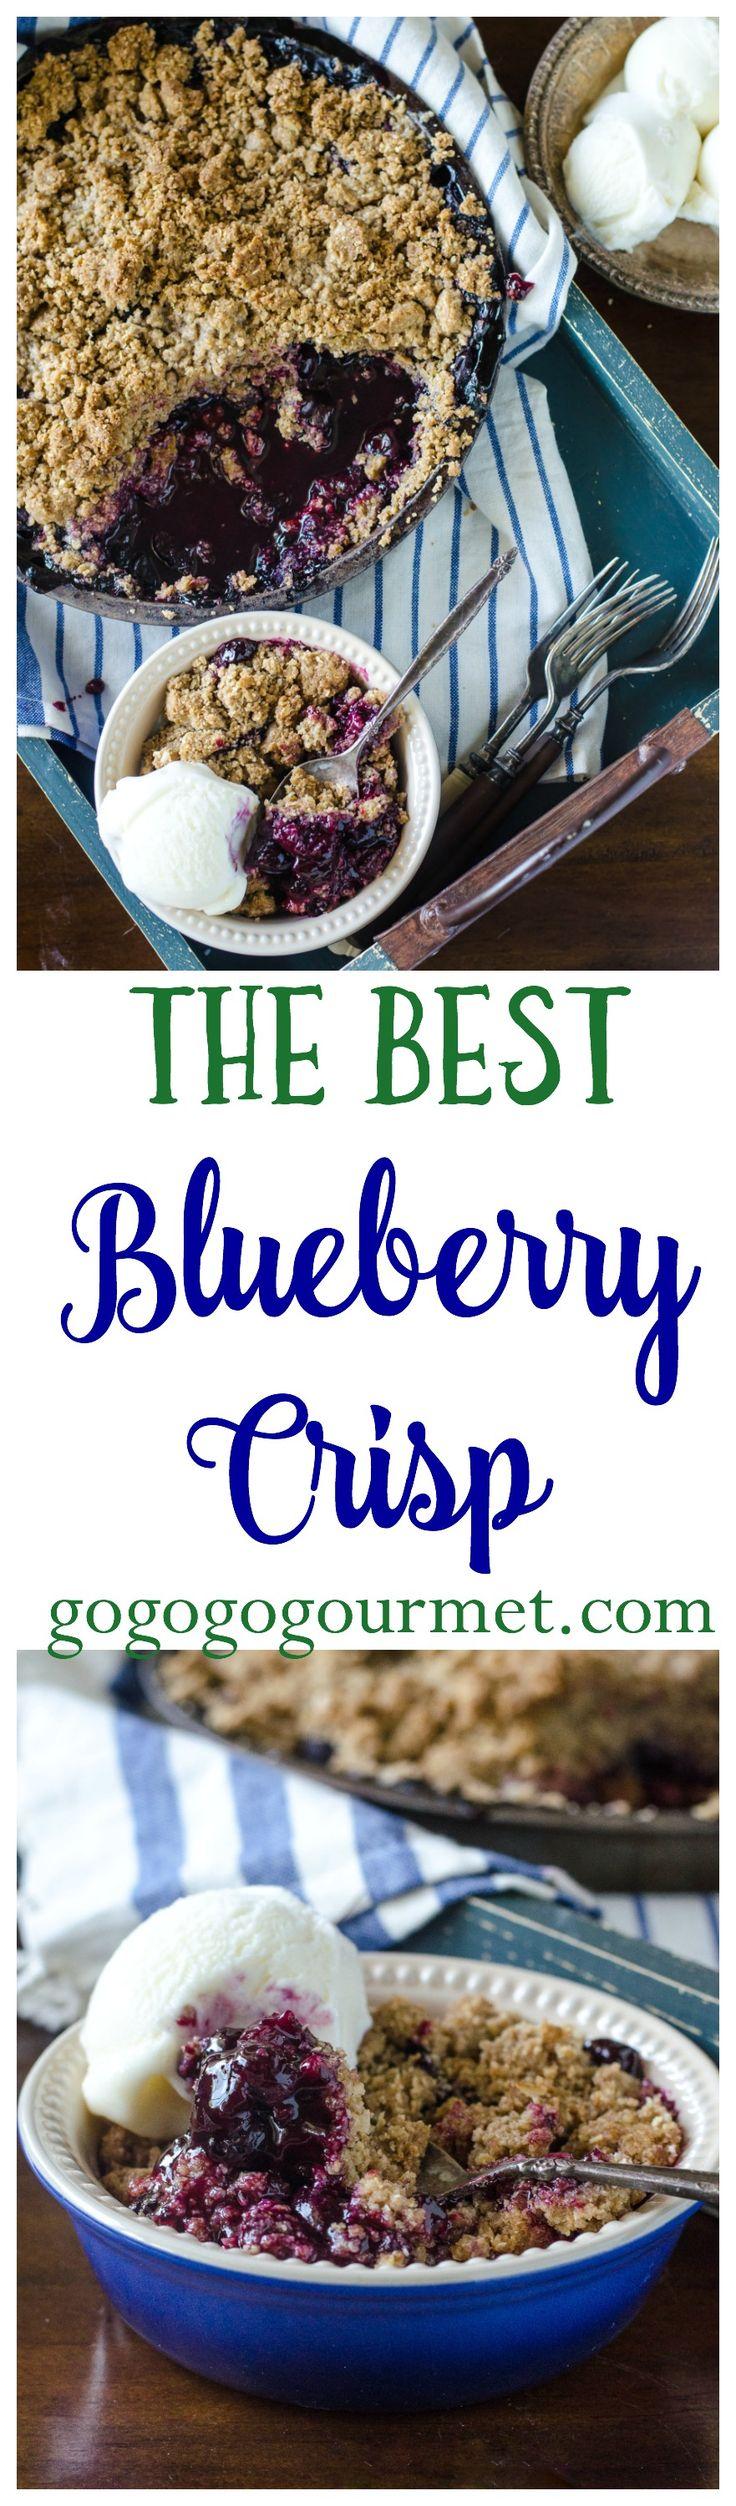 The BEST Blueberry Crisp recipe on all of Pinterest! | Go Go Go Gourmet @gogogogourmet